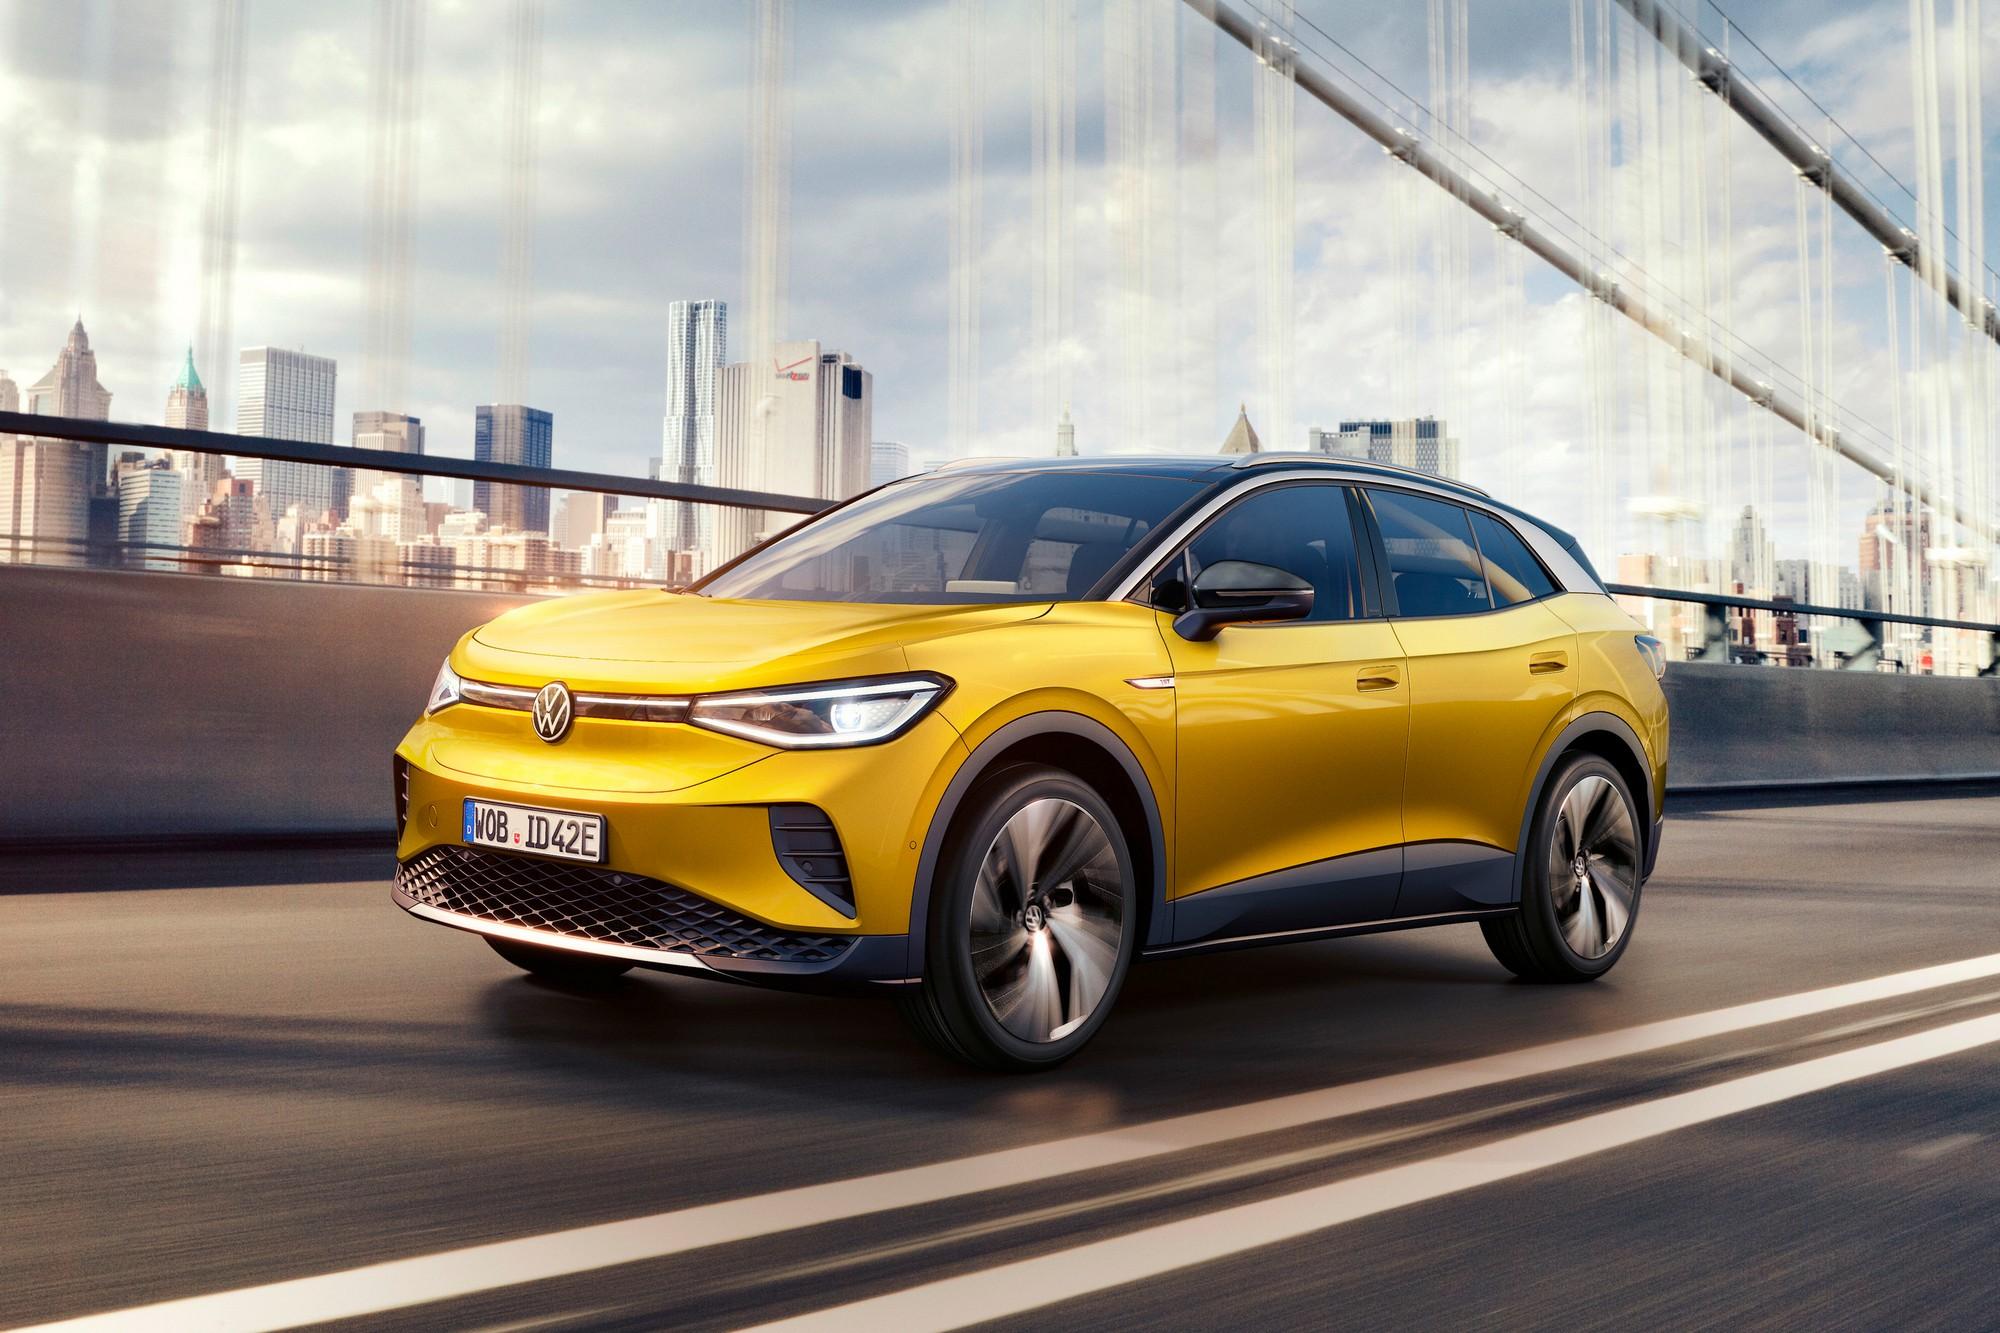 Электрокроссовер Volkswagen ID.4 представлен официально: мощность от 200  л.с., запас хода 520 км (WLTP) и ценник от $39,9 тыс. - ITC.ua